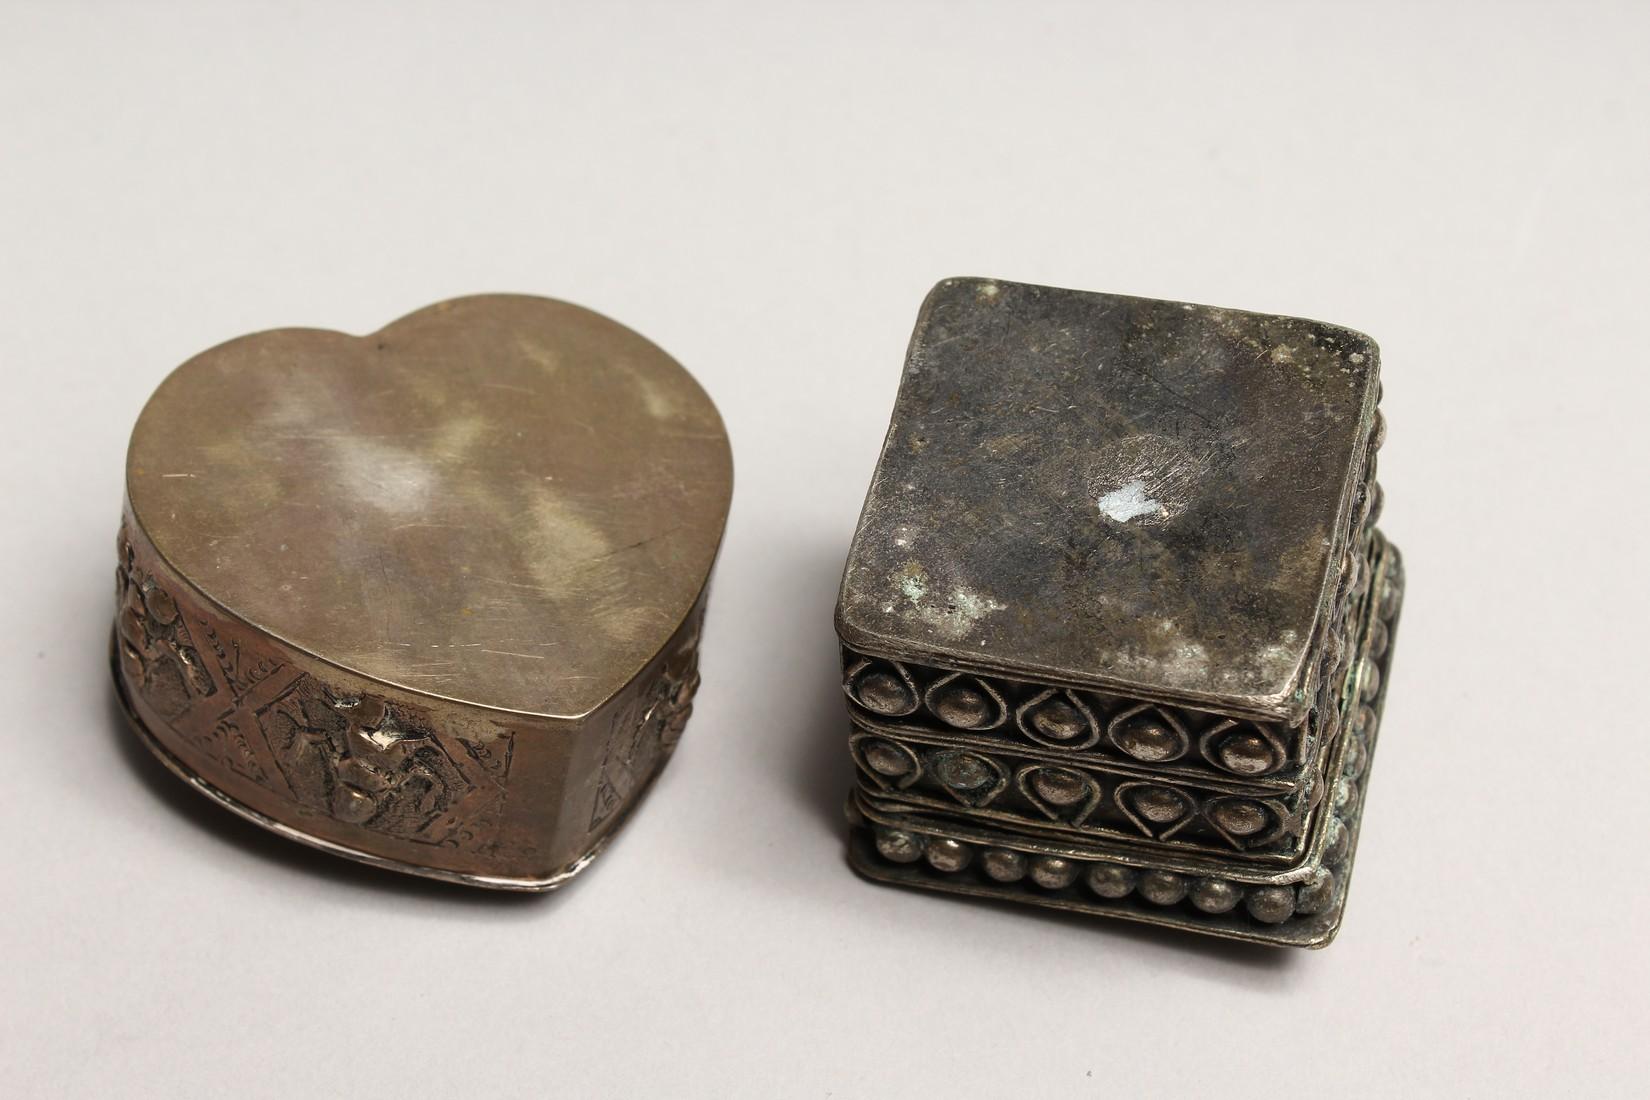 AN INDIAN SHAPED BOX AND A FILIGREE BOX (2). - Image 2 of 3